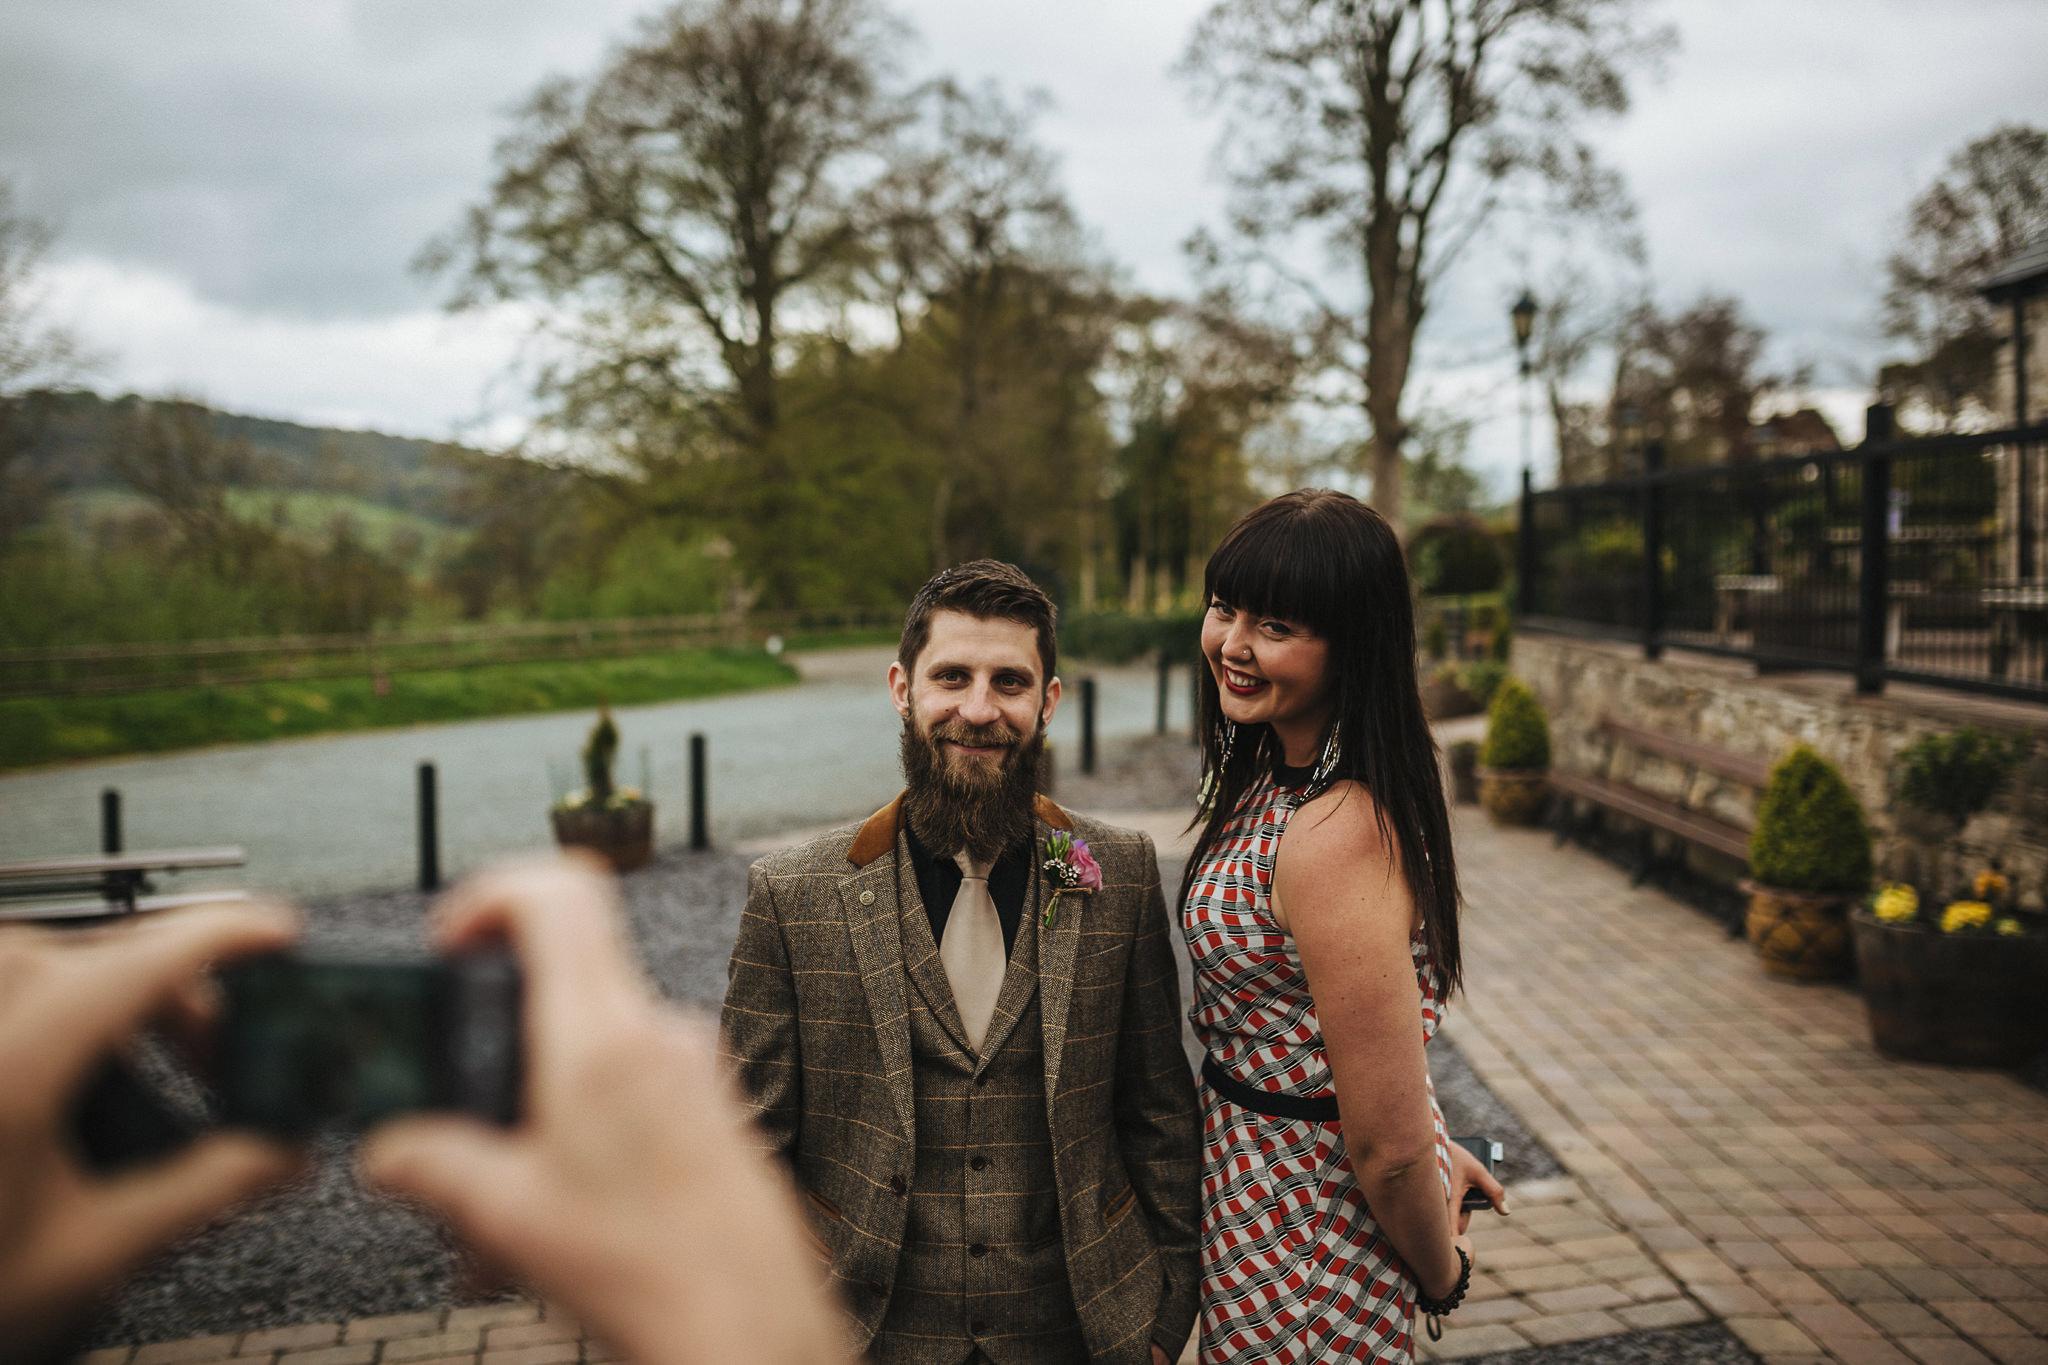 plas-isaf-corwen-north wales wedding-photography-photographer-91047